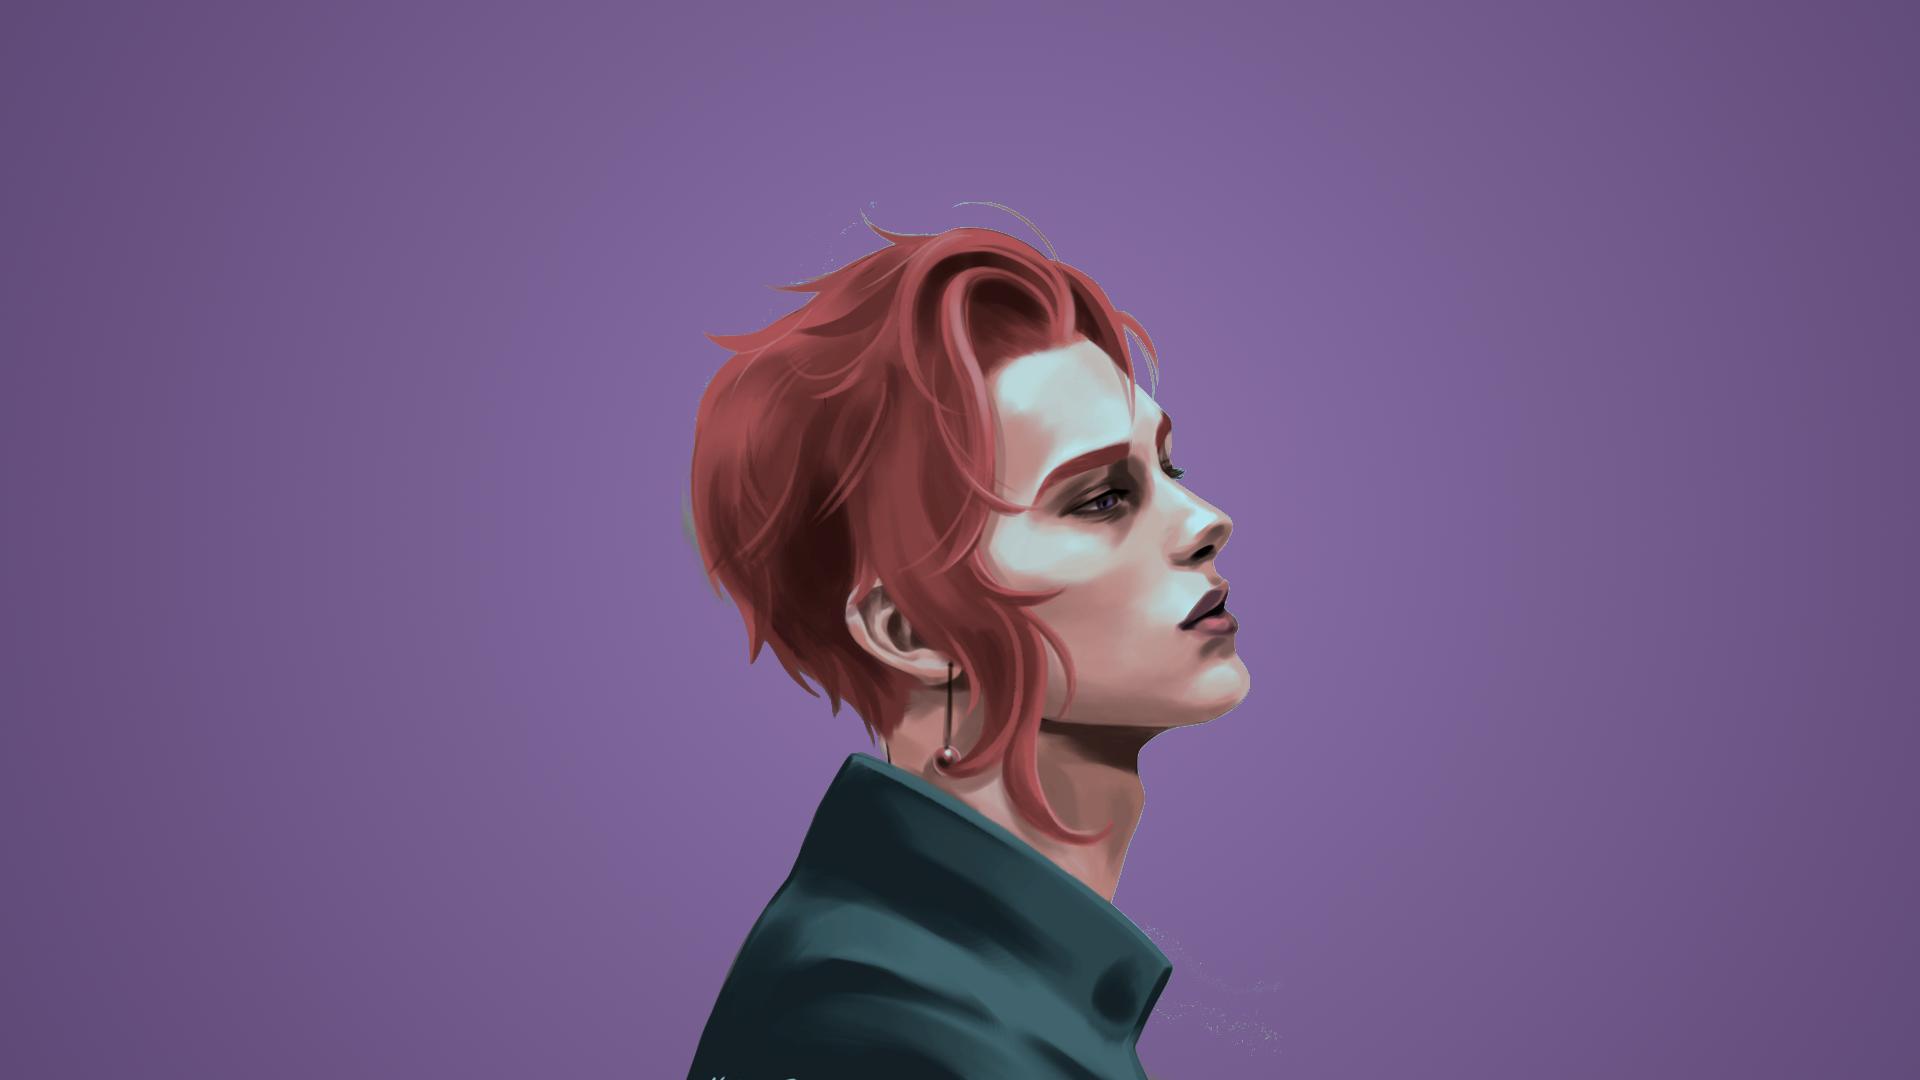 Wallpaper : Face, Illustration, Redhead, Model, Portrait